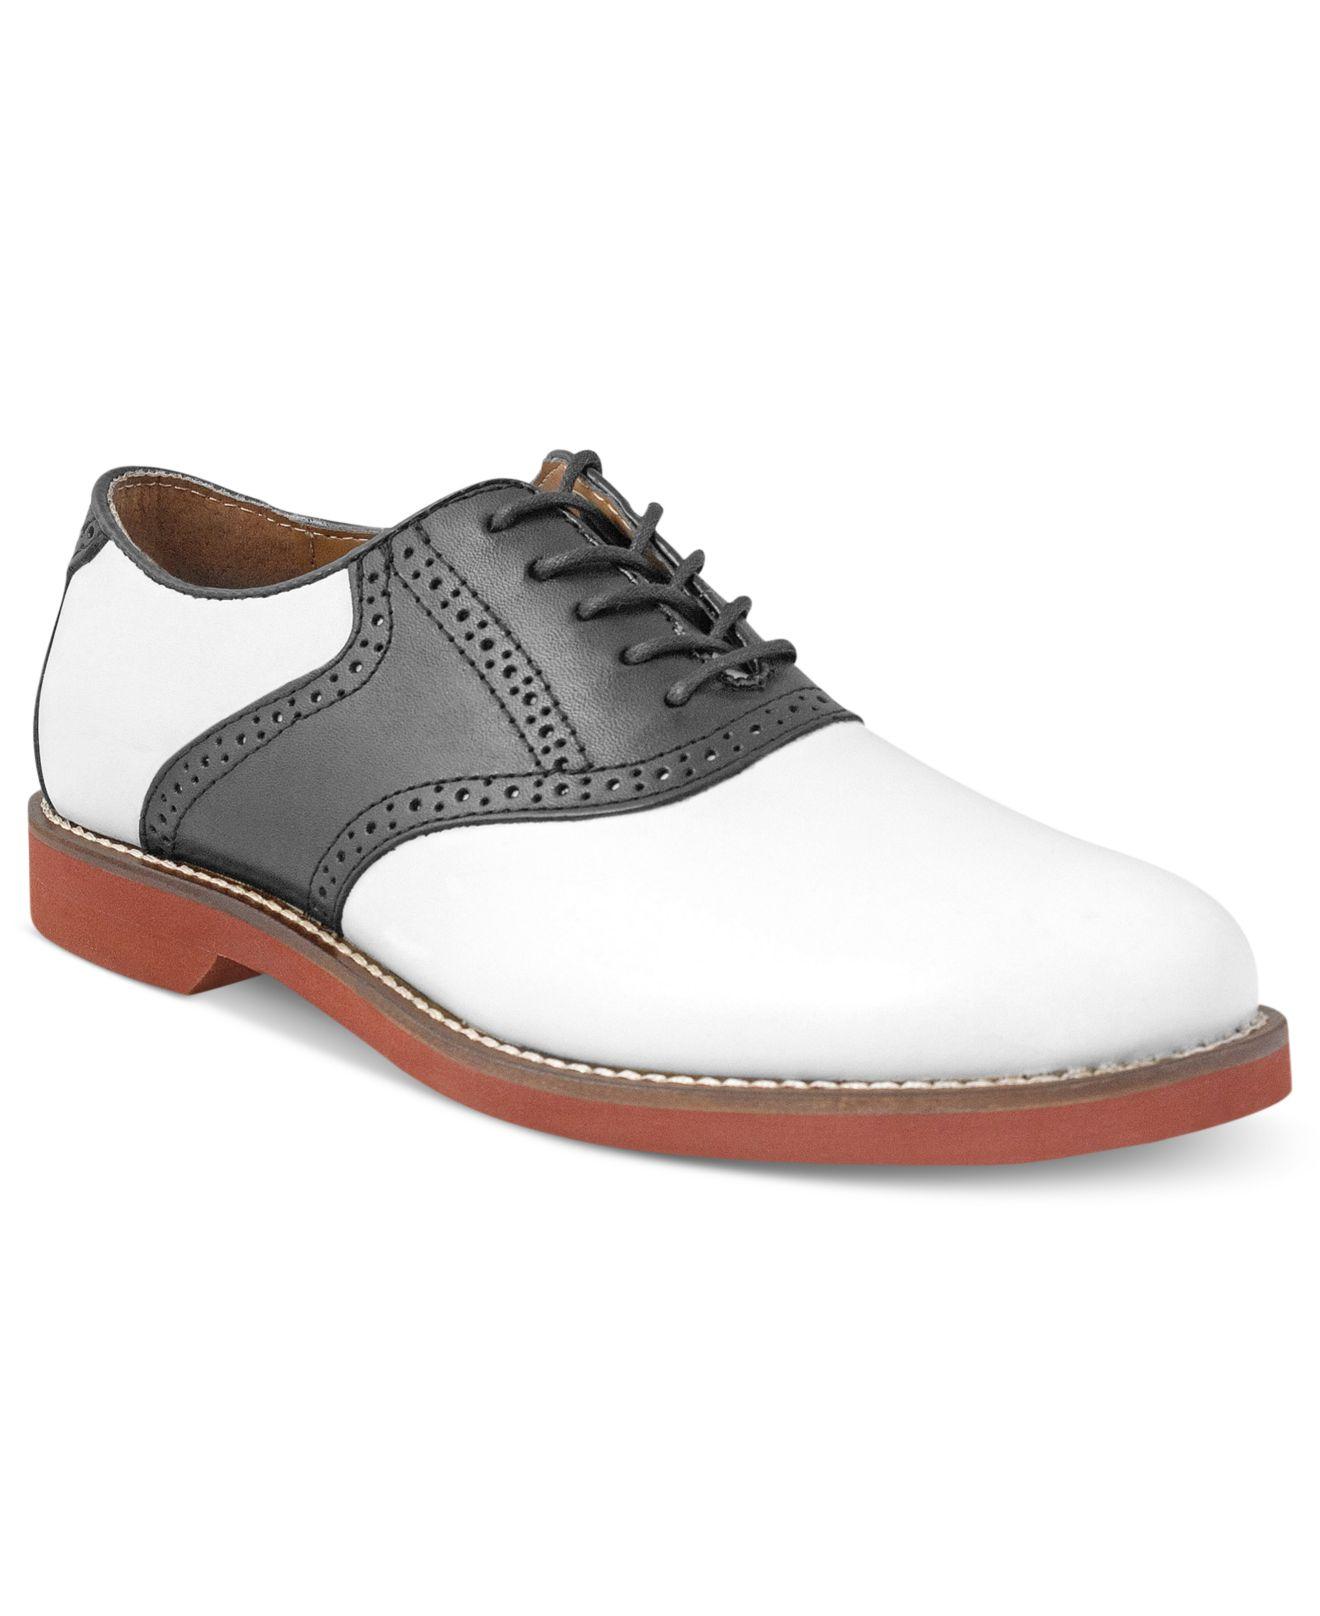 g h bass co bass burlington plain toe saddle shoes in